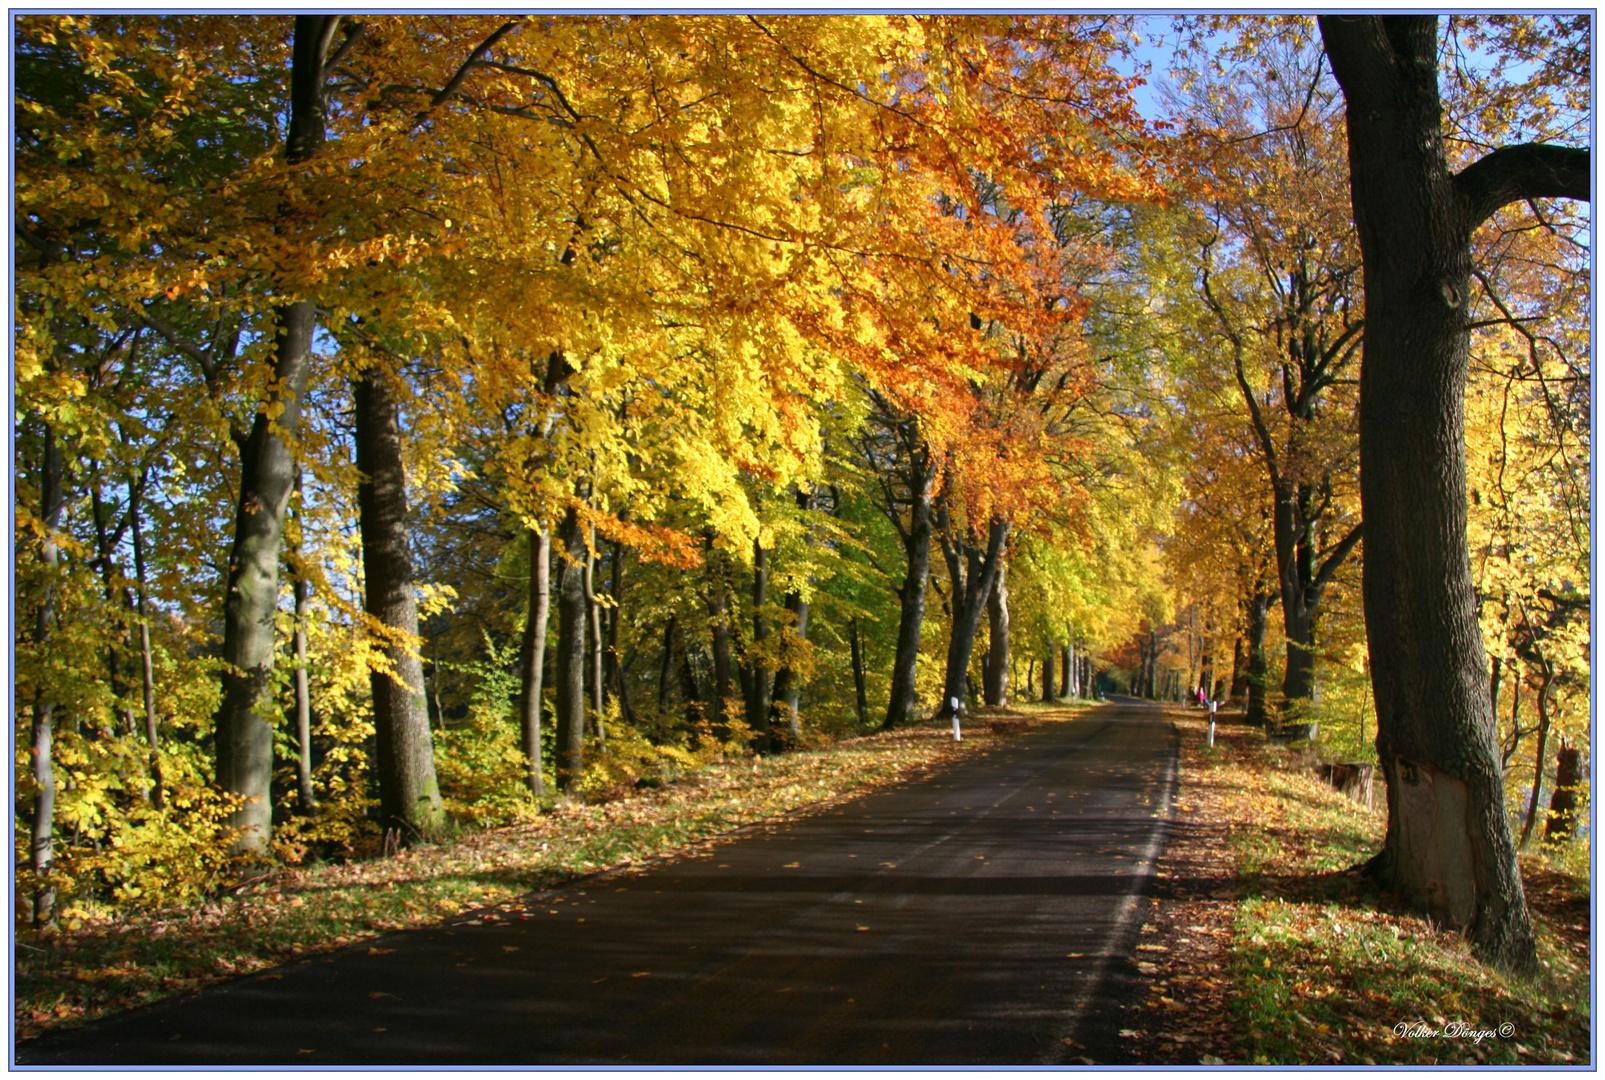 Herbstspaziergang am 31.10.2010